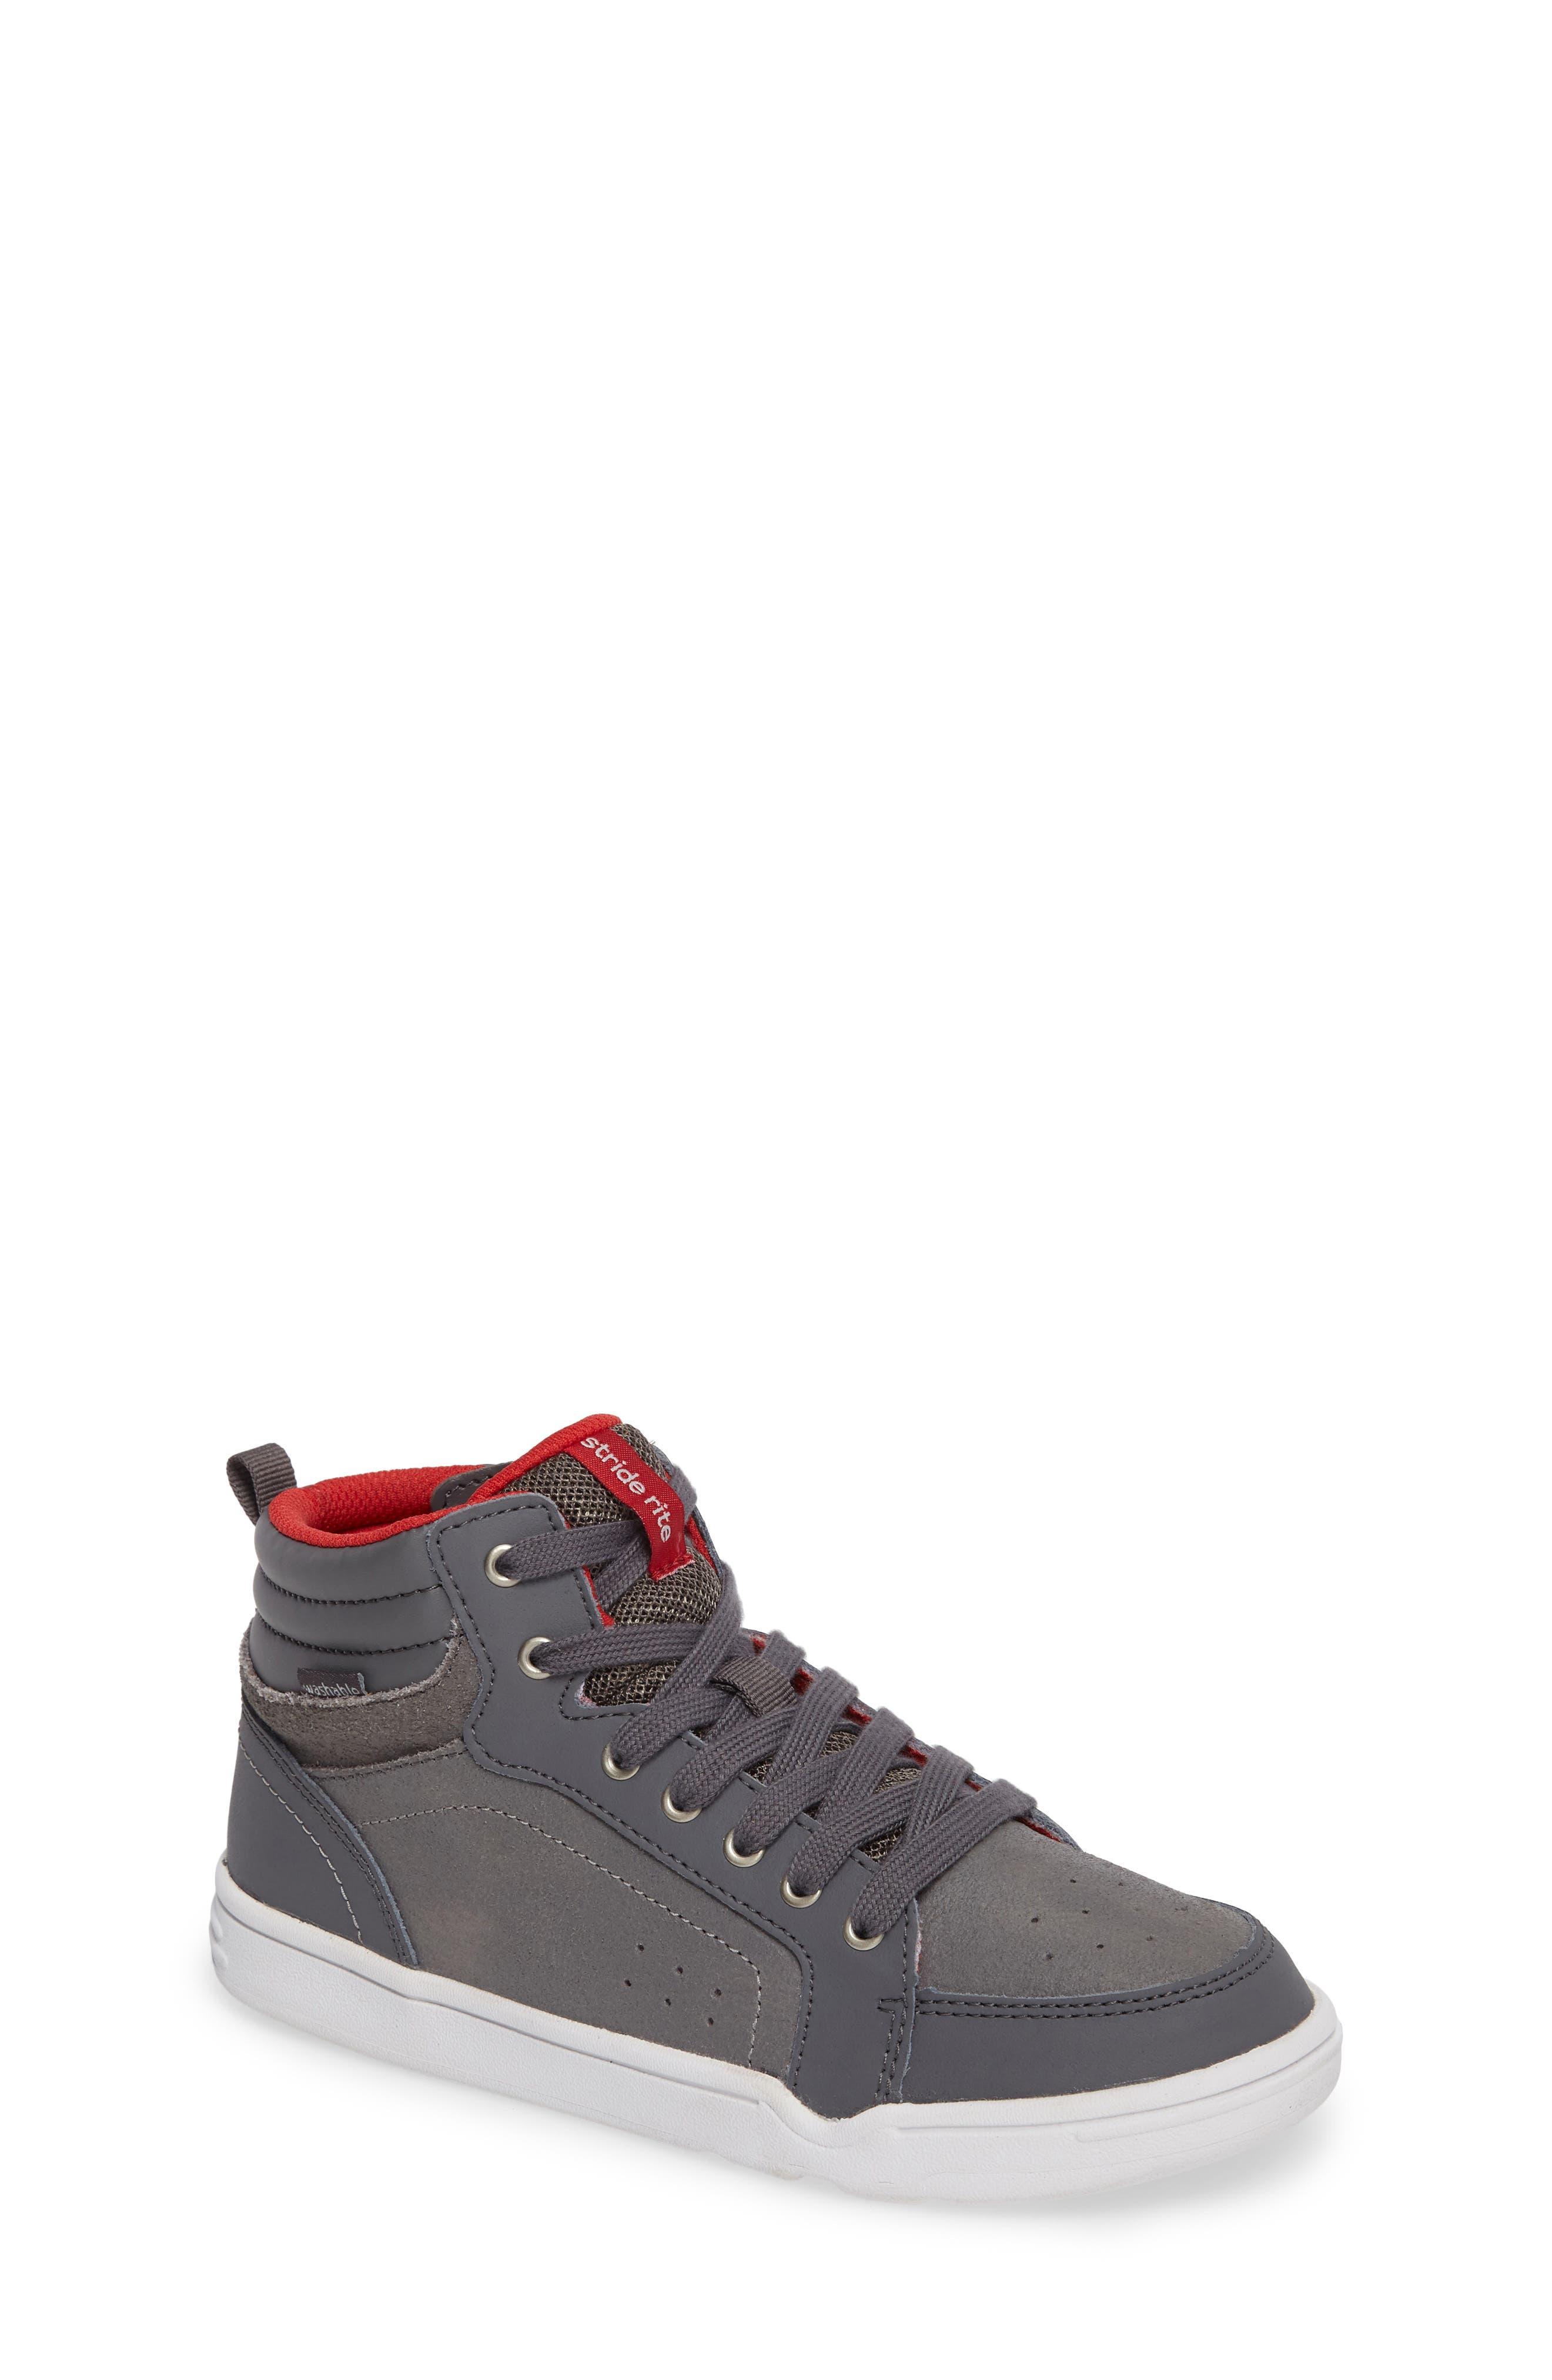 Made 2 Play<sup>®</sup> Kaleb Sneaker,                         Main,                         color, 021